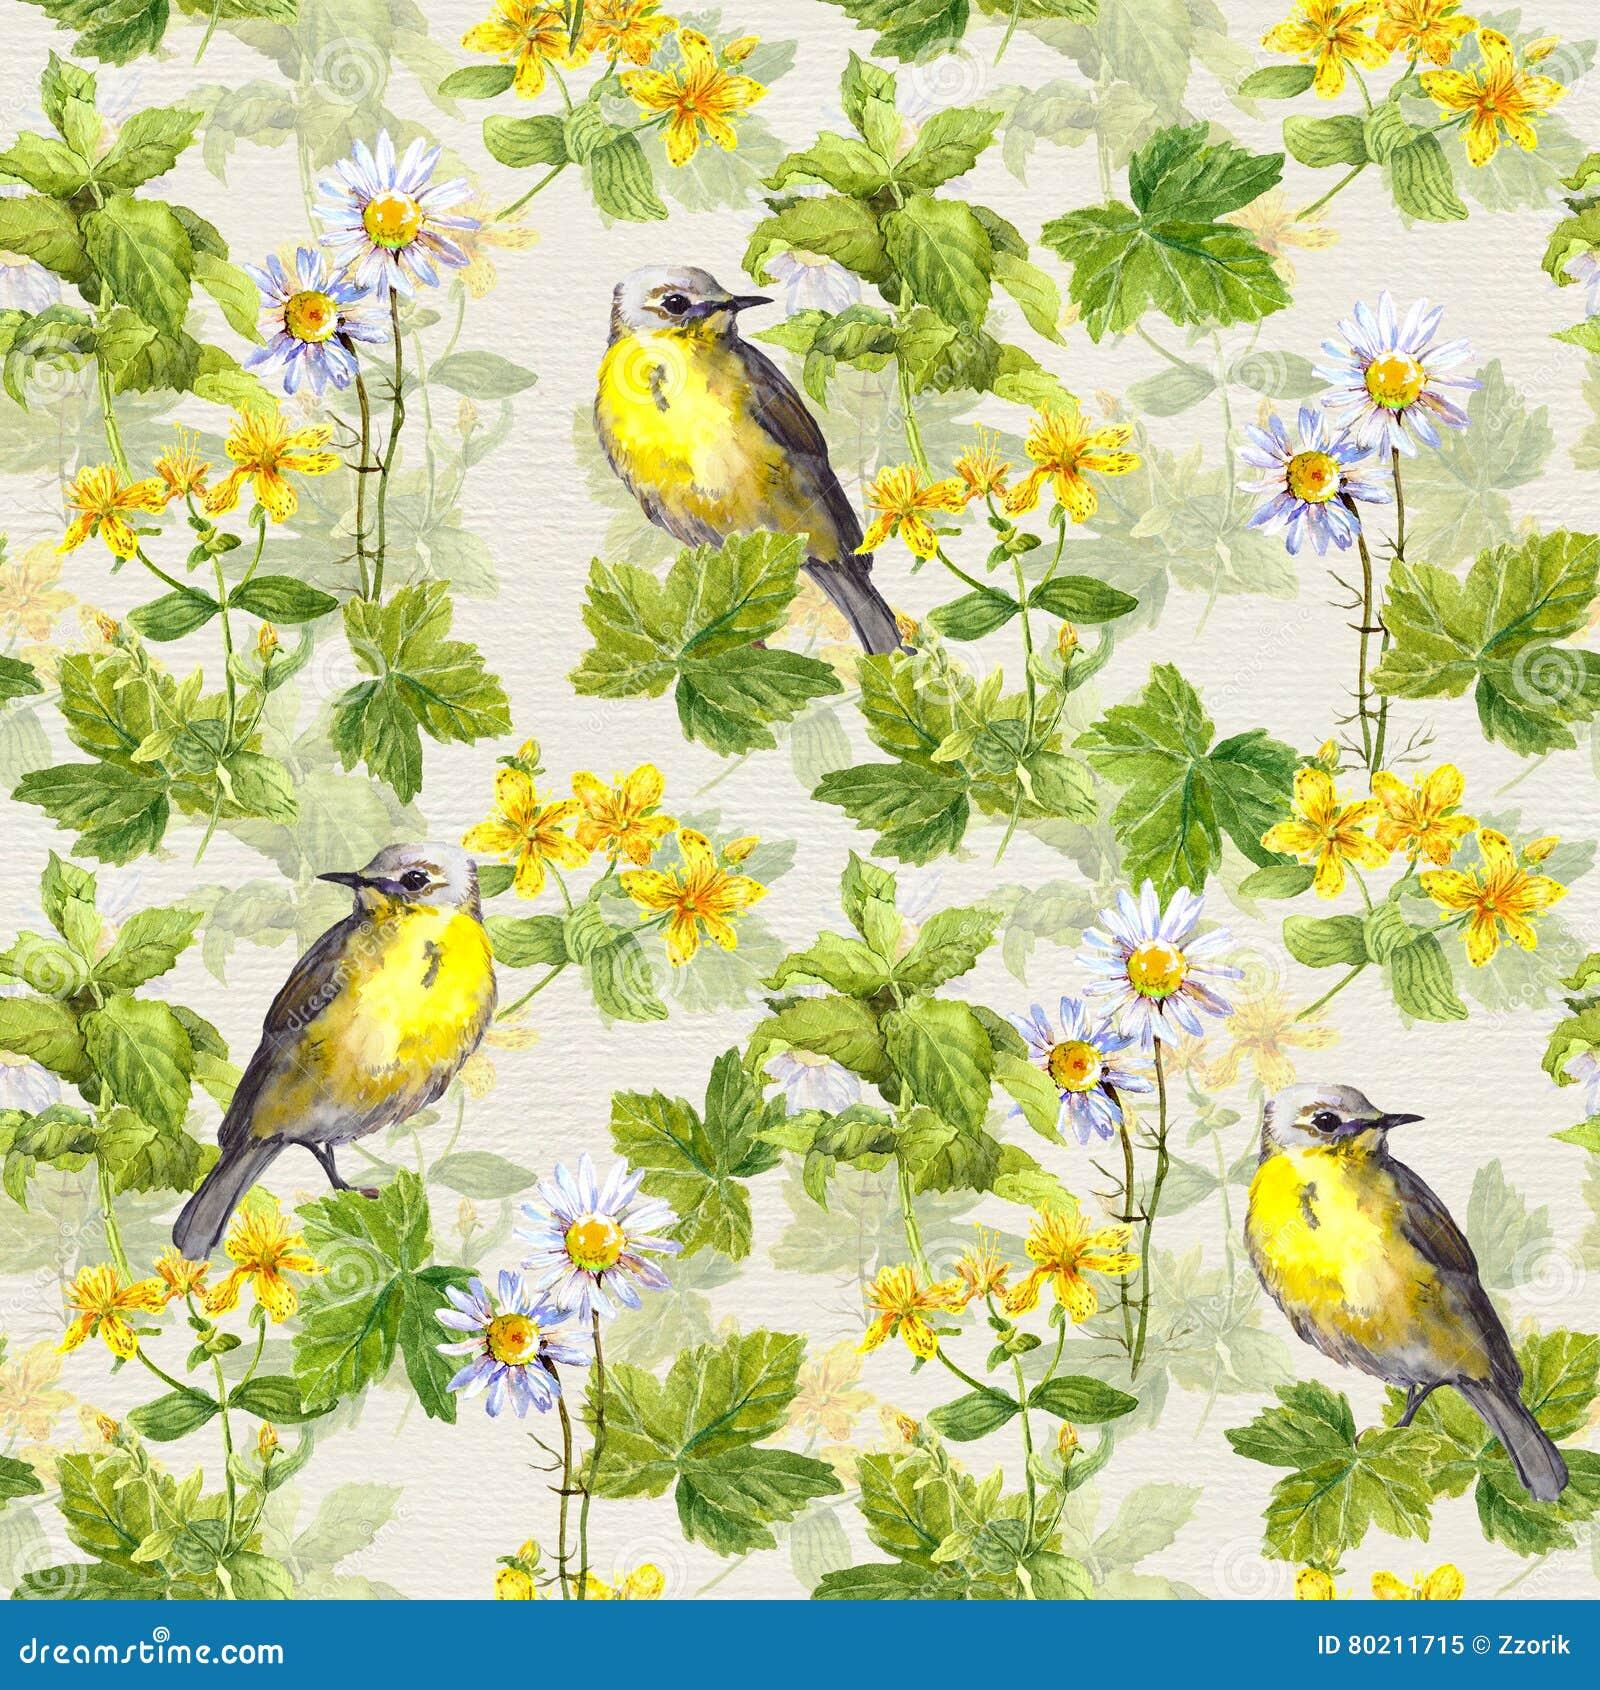 Repetitive pattern: wild herbs, flowers, grass, bird. Floral watercolour